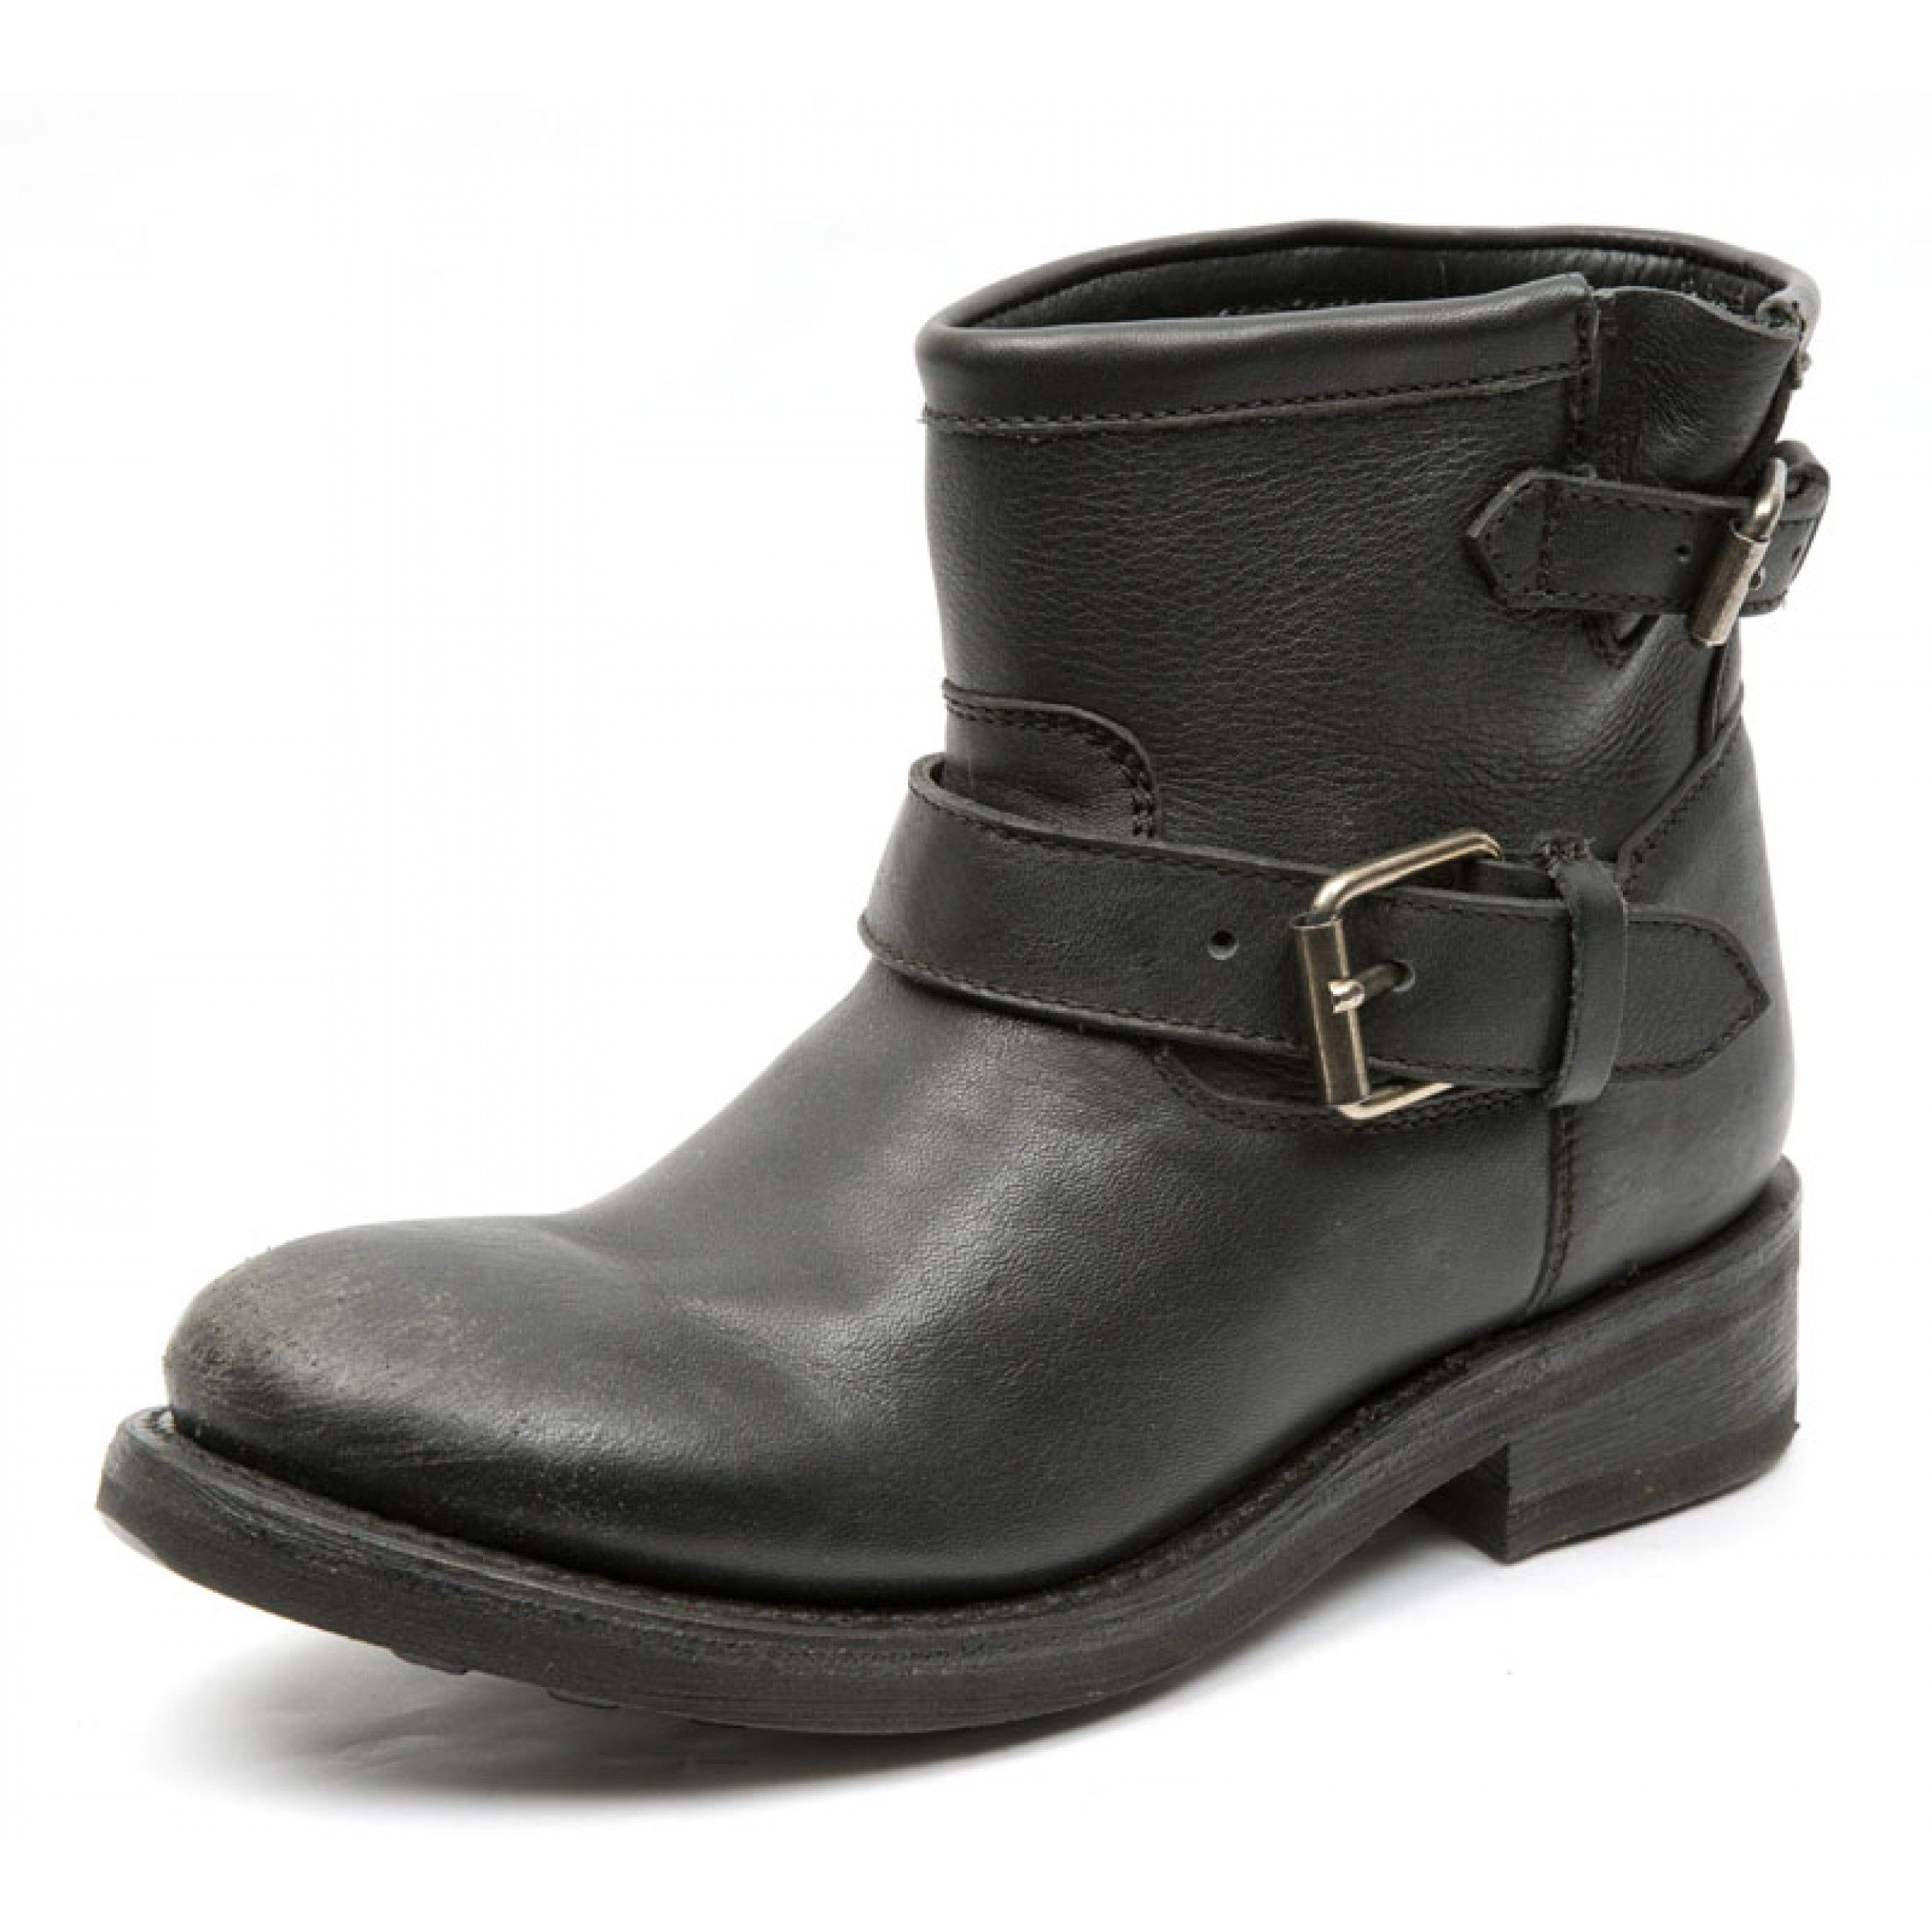 b4302c97a2b4 Chaussures Ash - TEARS DESTROYER NAPPA .BLACK - Femme